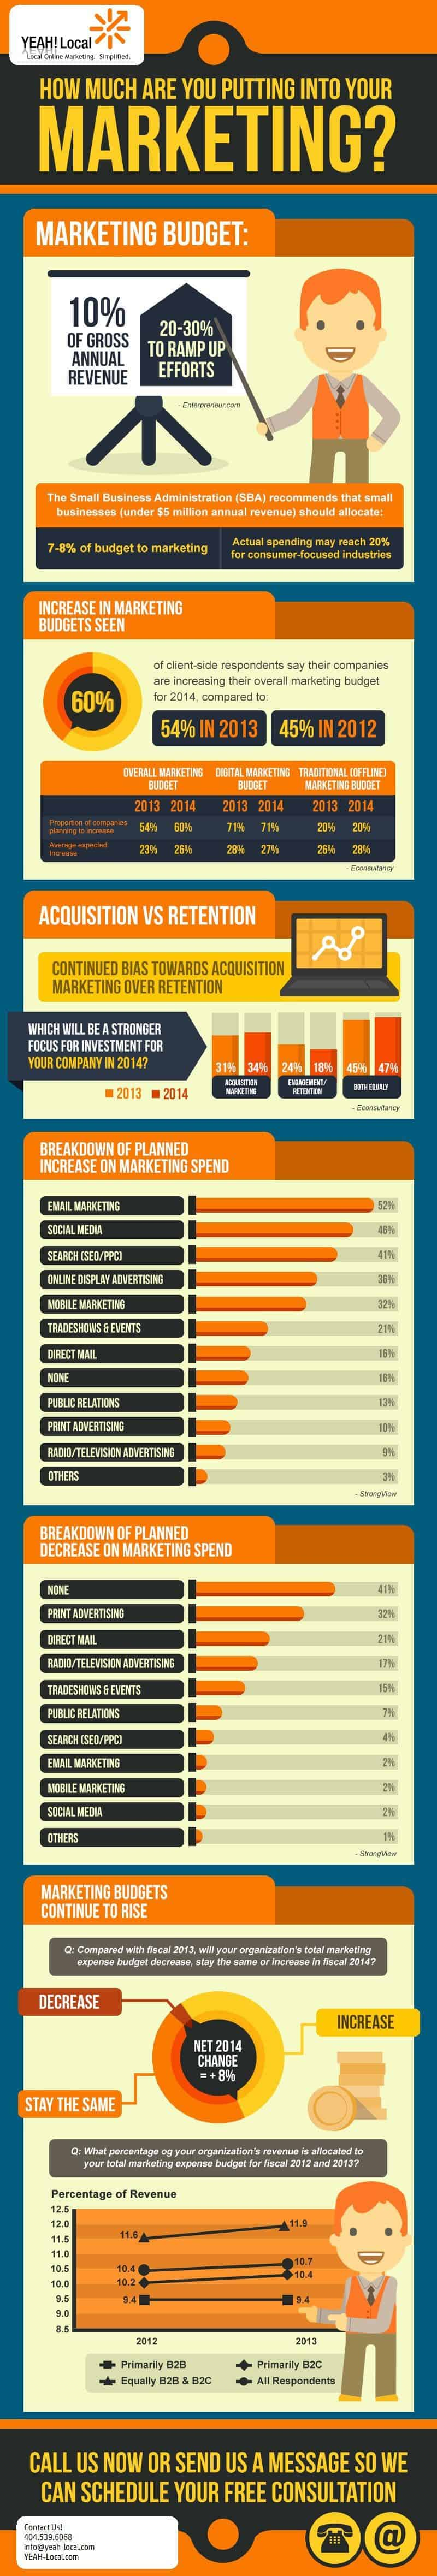 Atlanta Internet Marketing Services